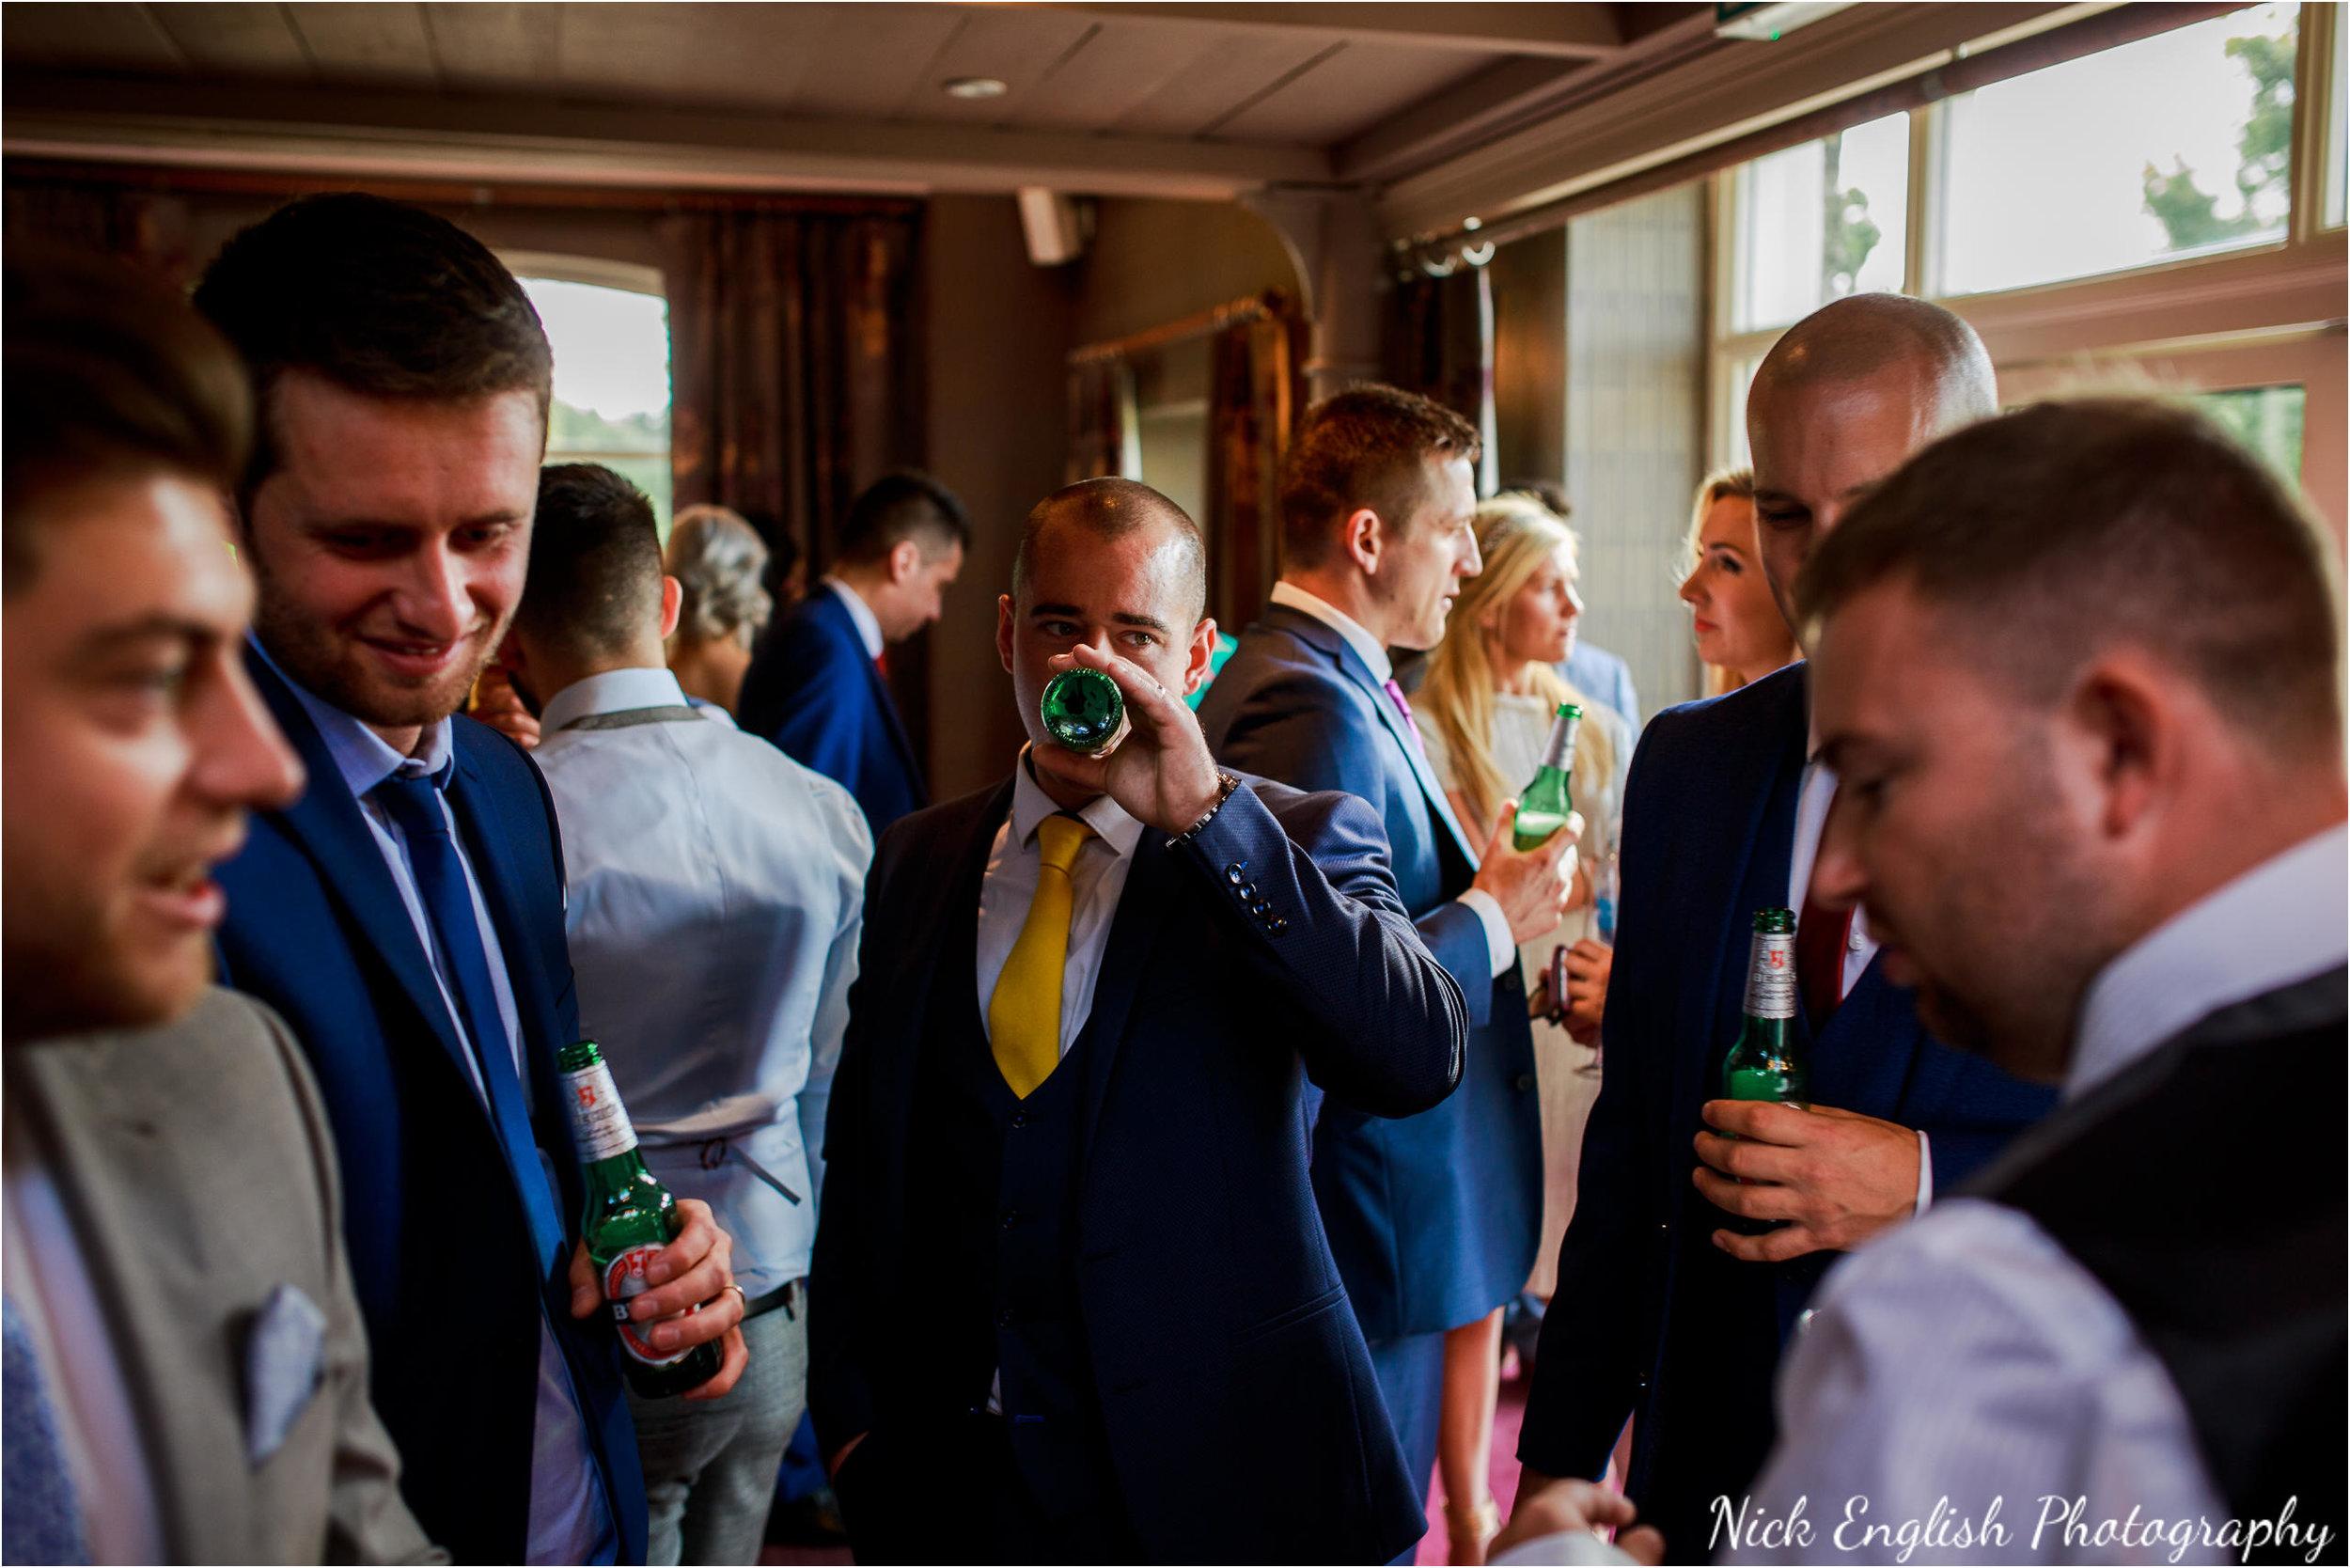 Stacey-Ash-Wedding-Photographs-Stanley-House-Preston-Lancashire-134.jpg